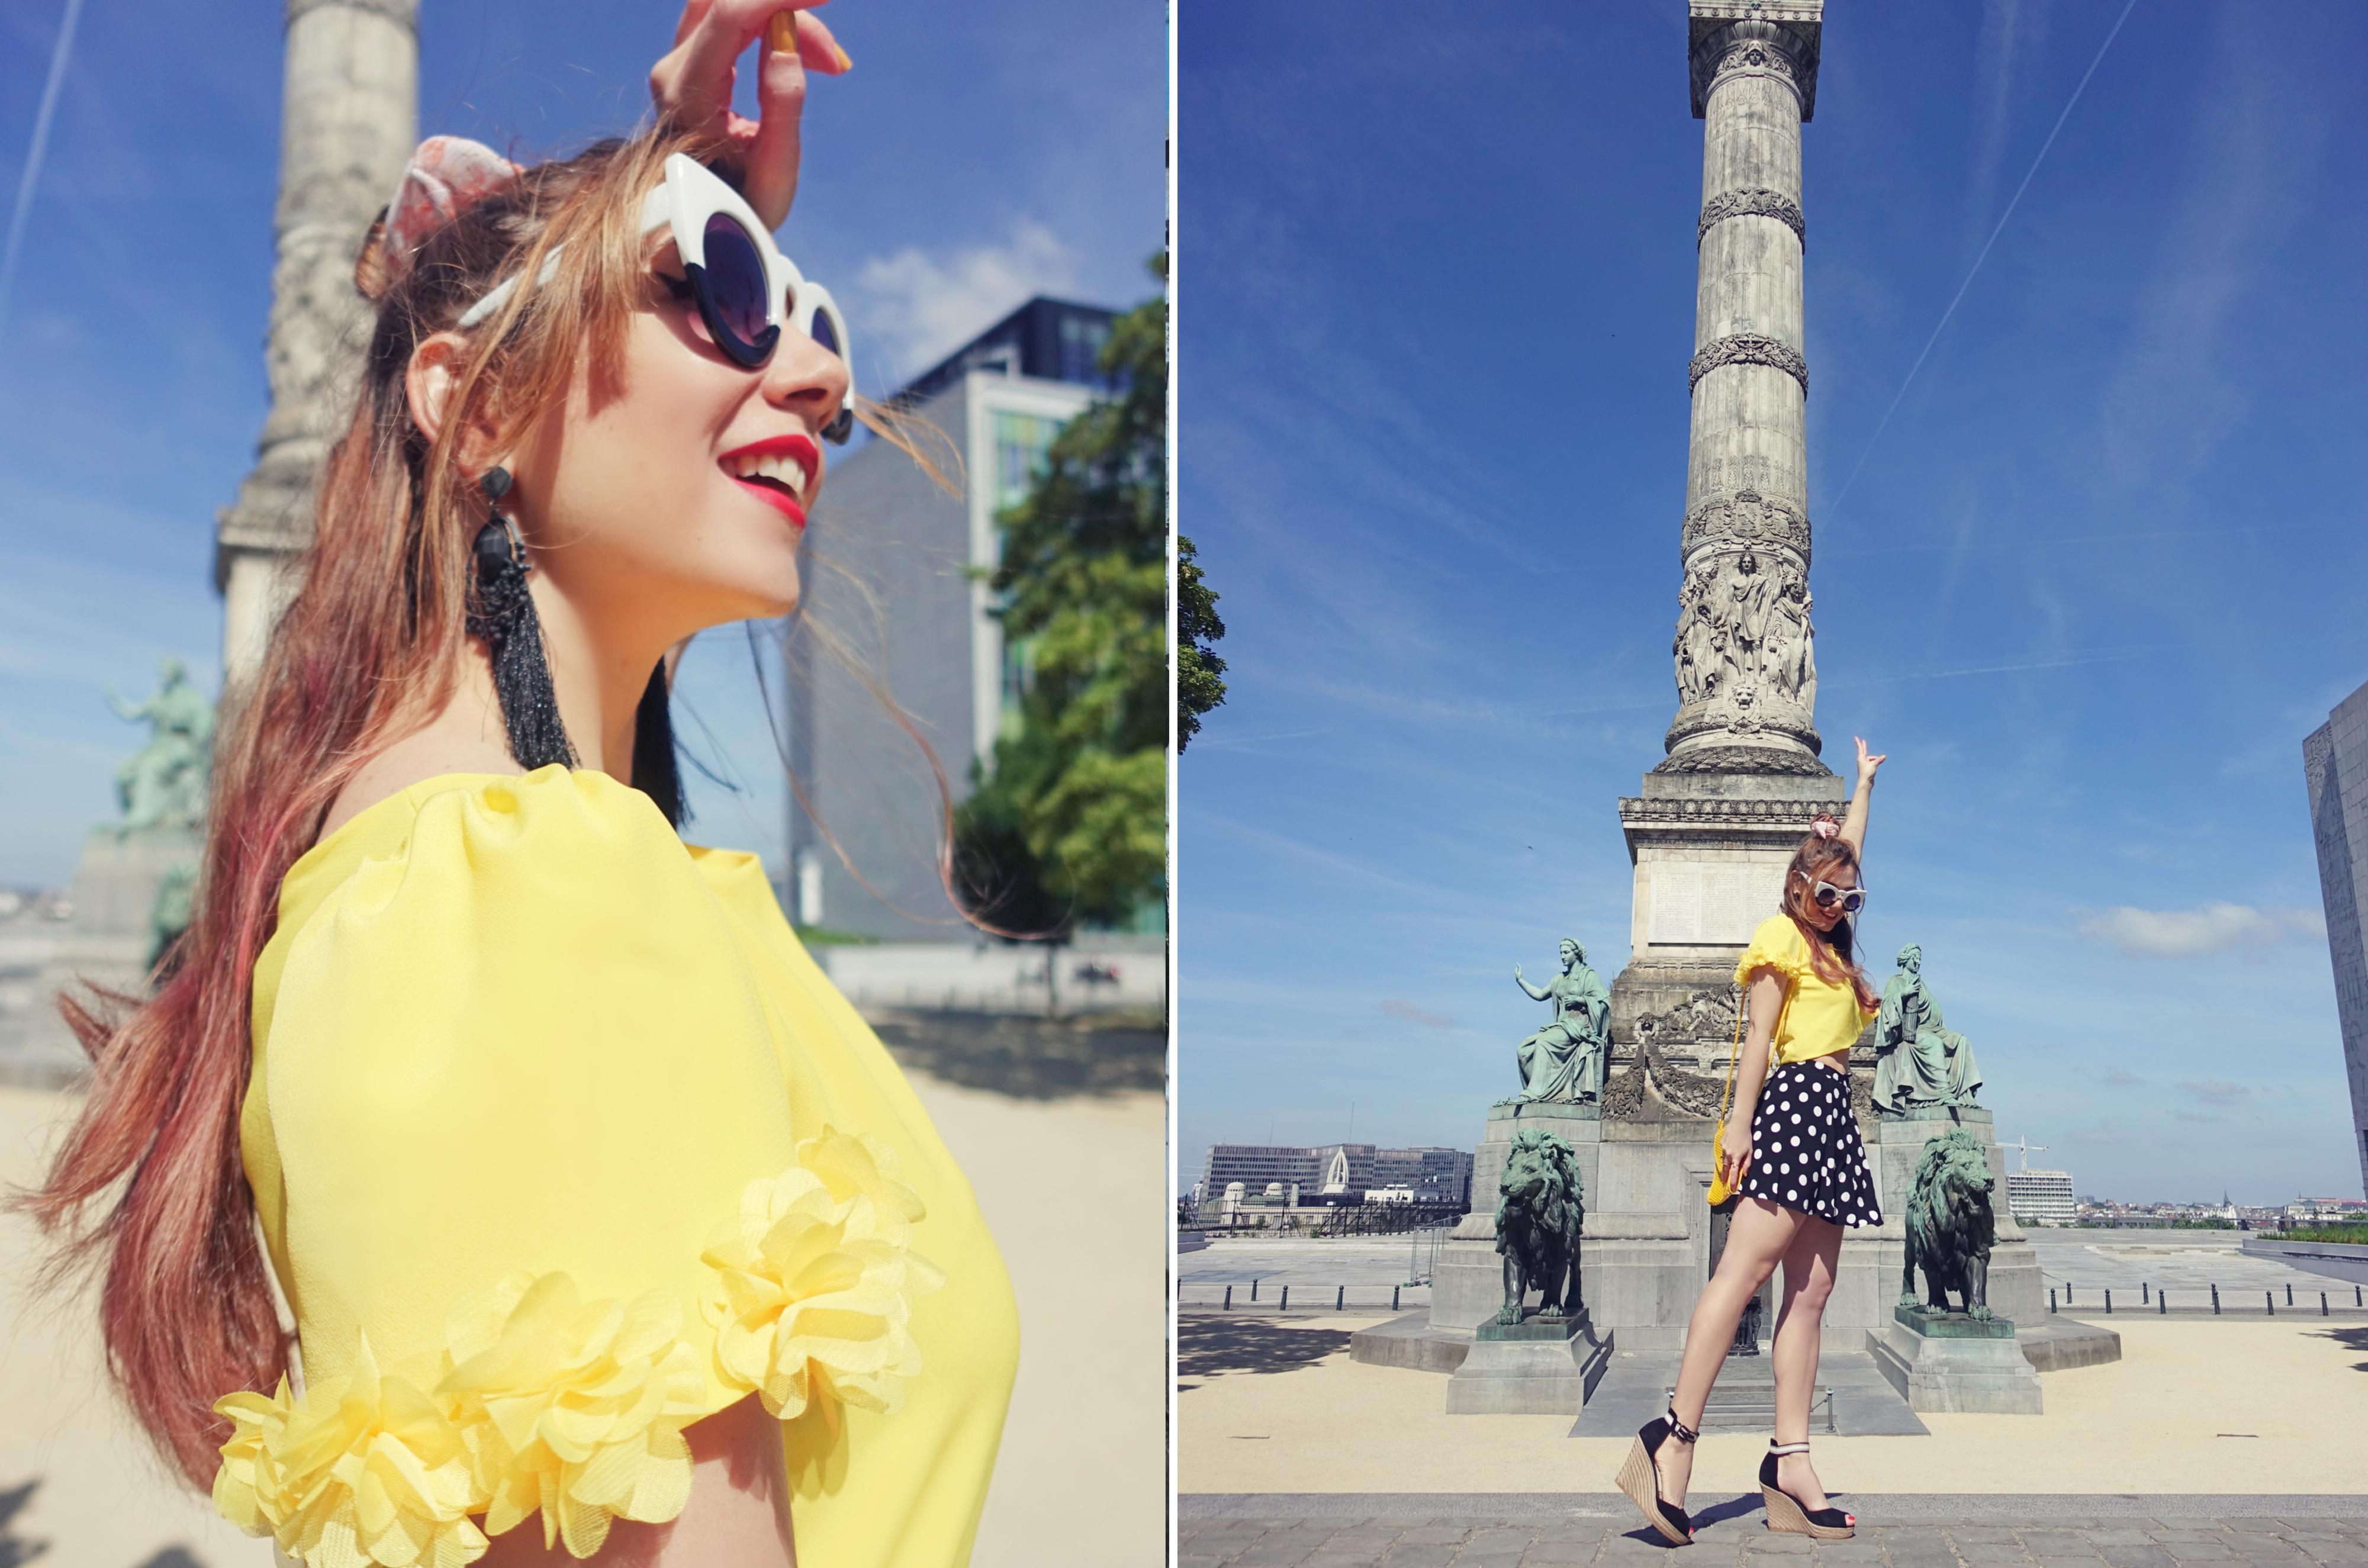 http://www.piensaenchic.com/wp-content/uploads/2018/07/Aramat-fashion-blog-de-moda-disenadores-espanoles-PiensaenChic-Chicadicta-fashionista-look-amarillo-influencer-Piensa-en-Chic-Chic-adicta.jpg